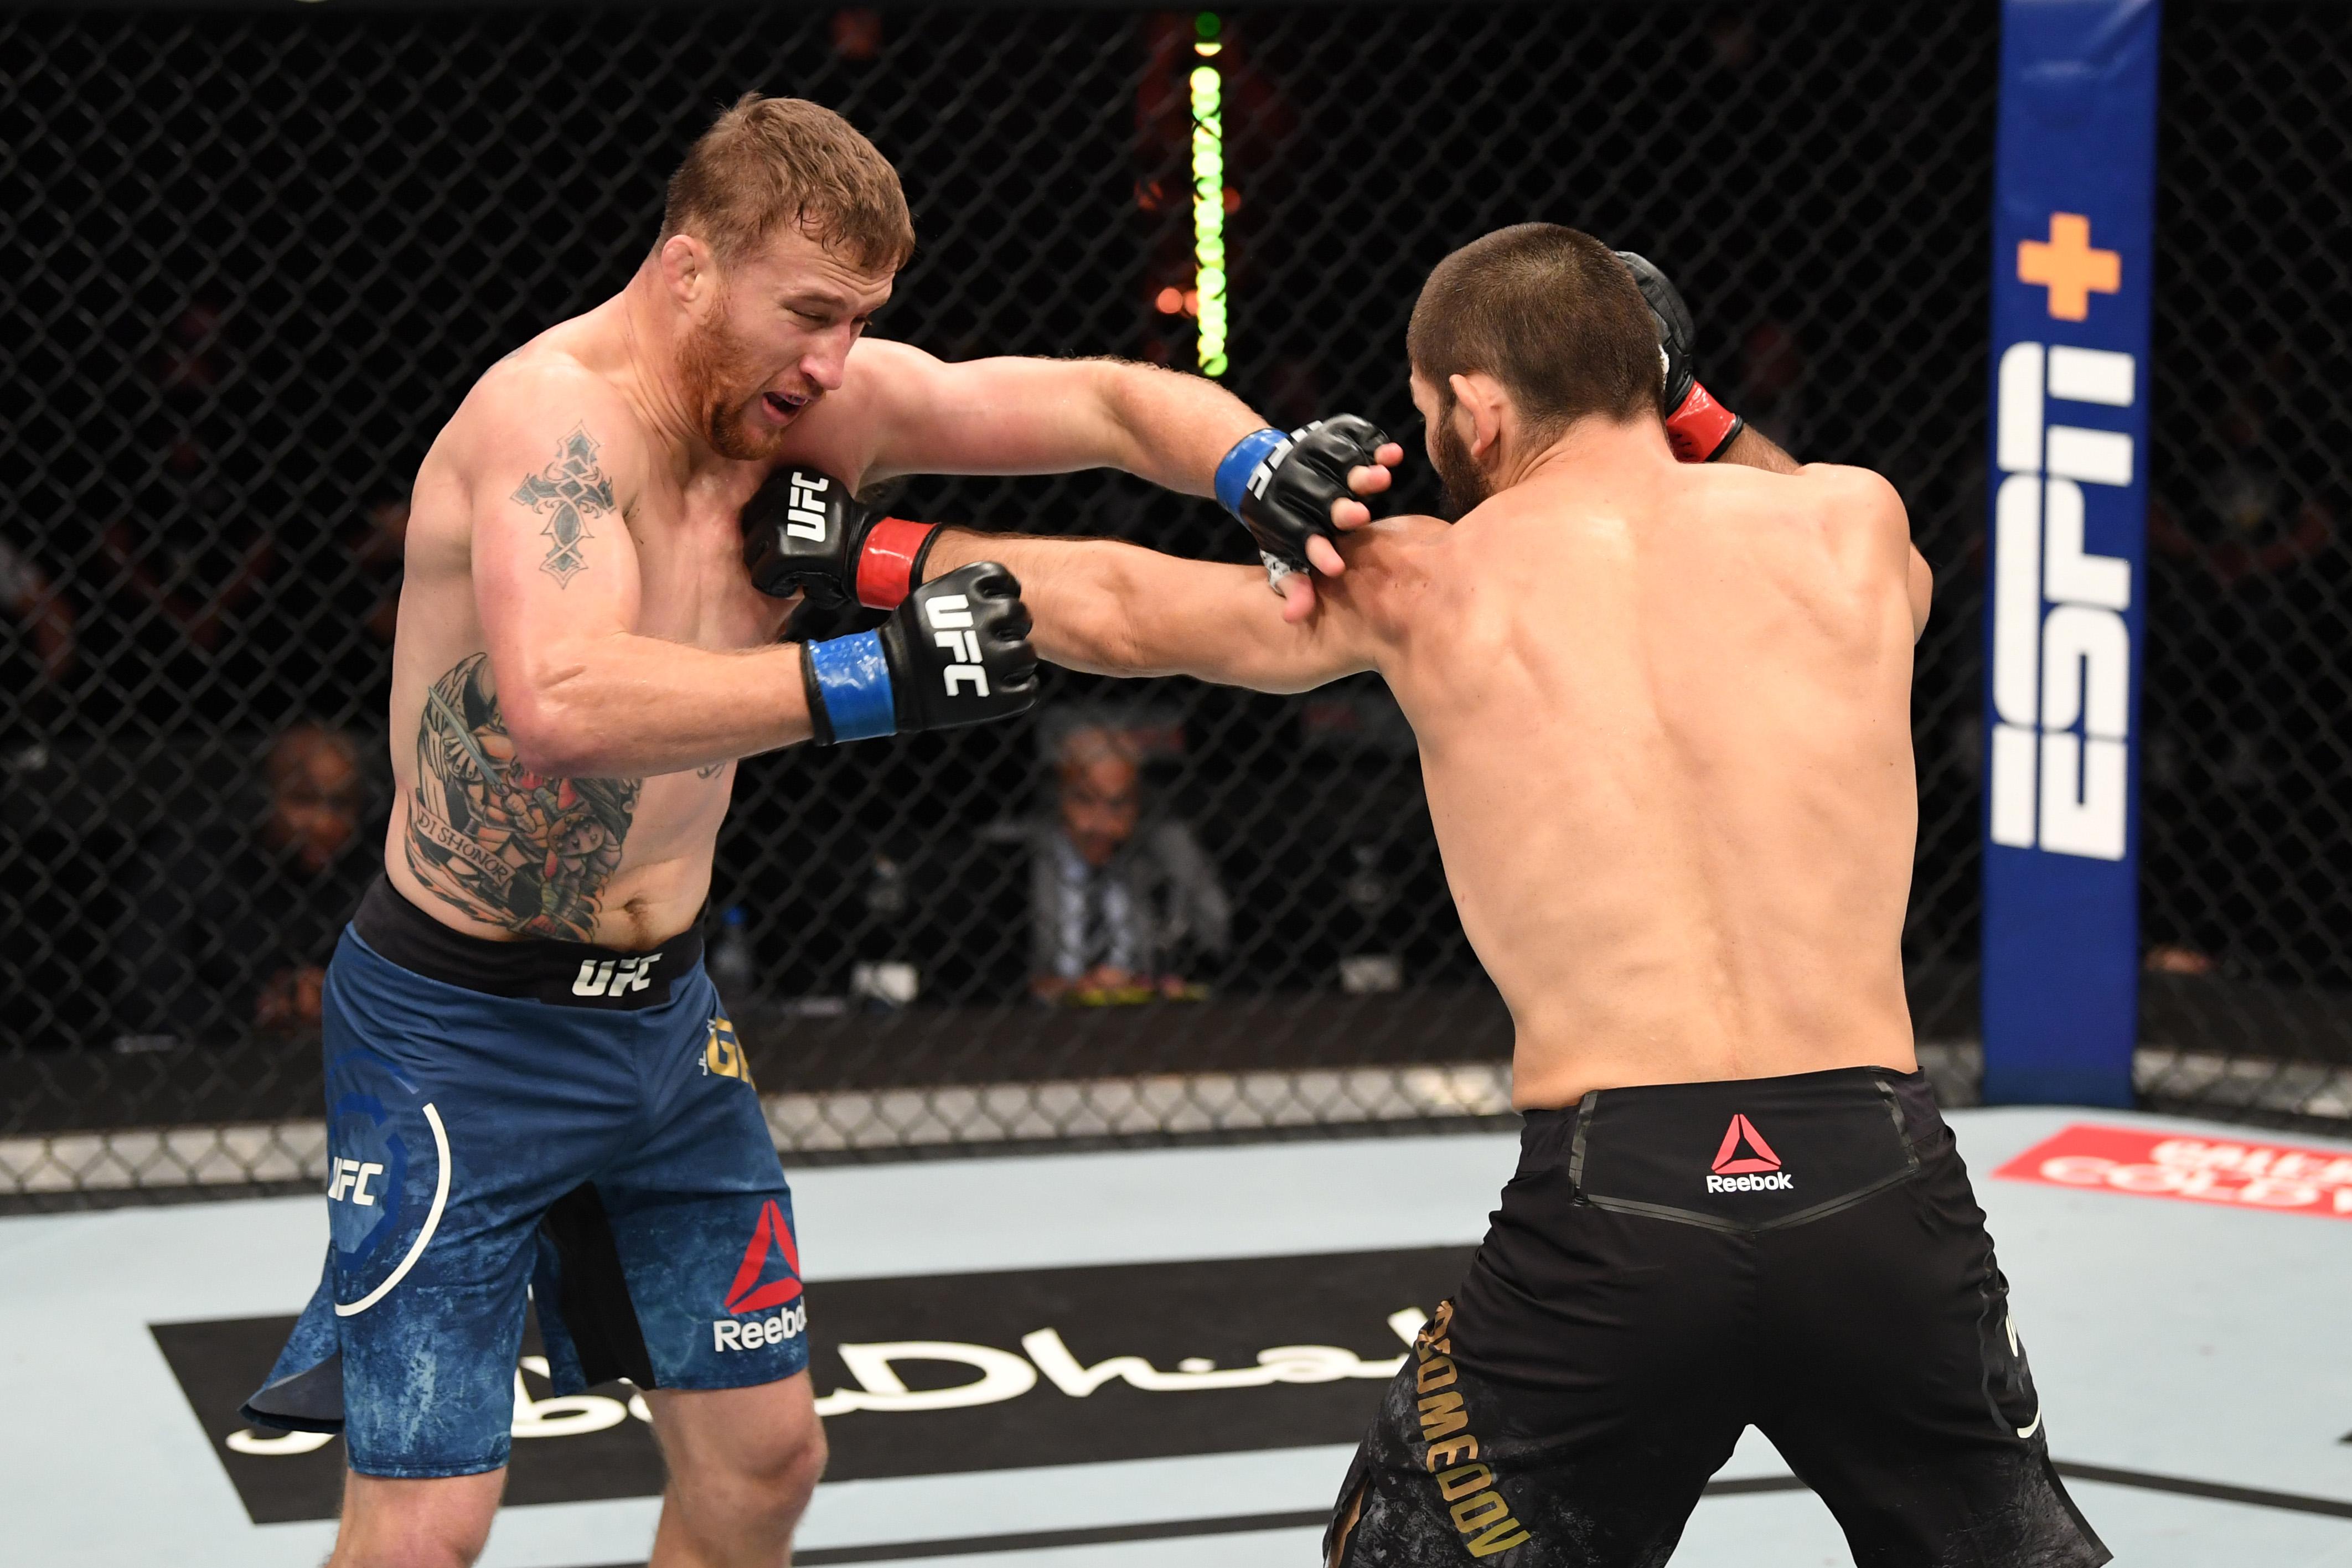 Justin Gaethje takes a punch from Khabib Nurmagomedov at UFC 254.